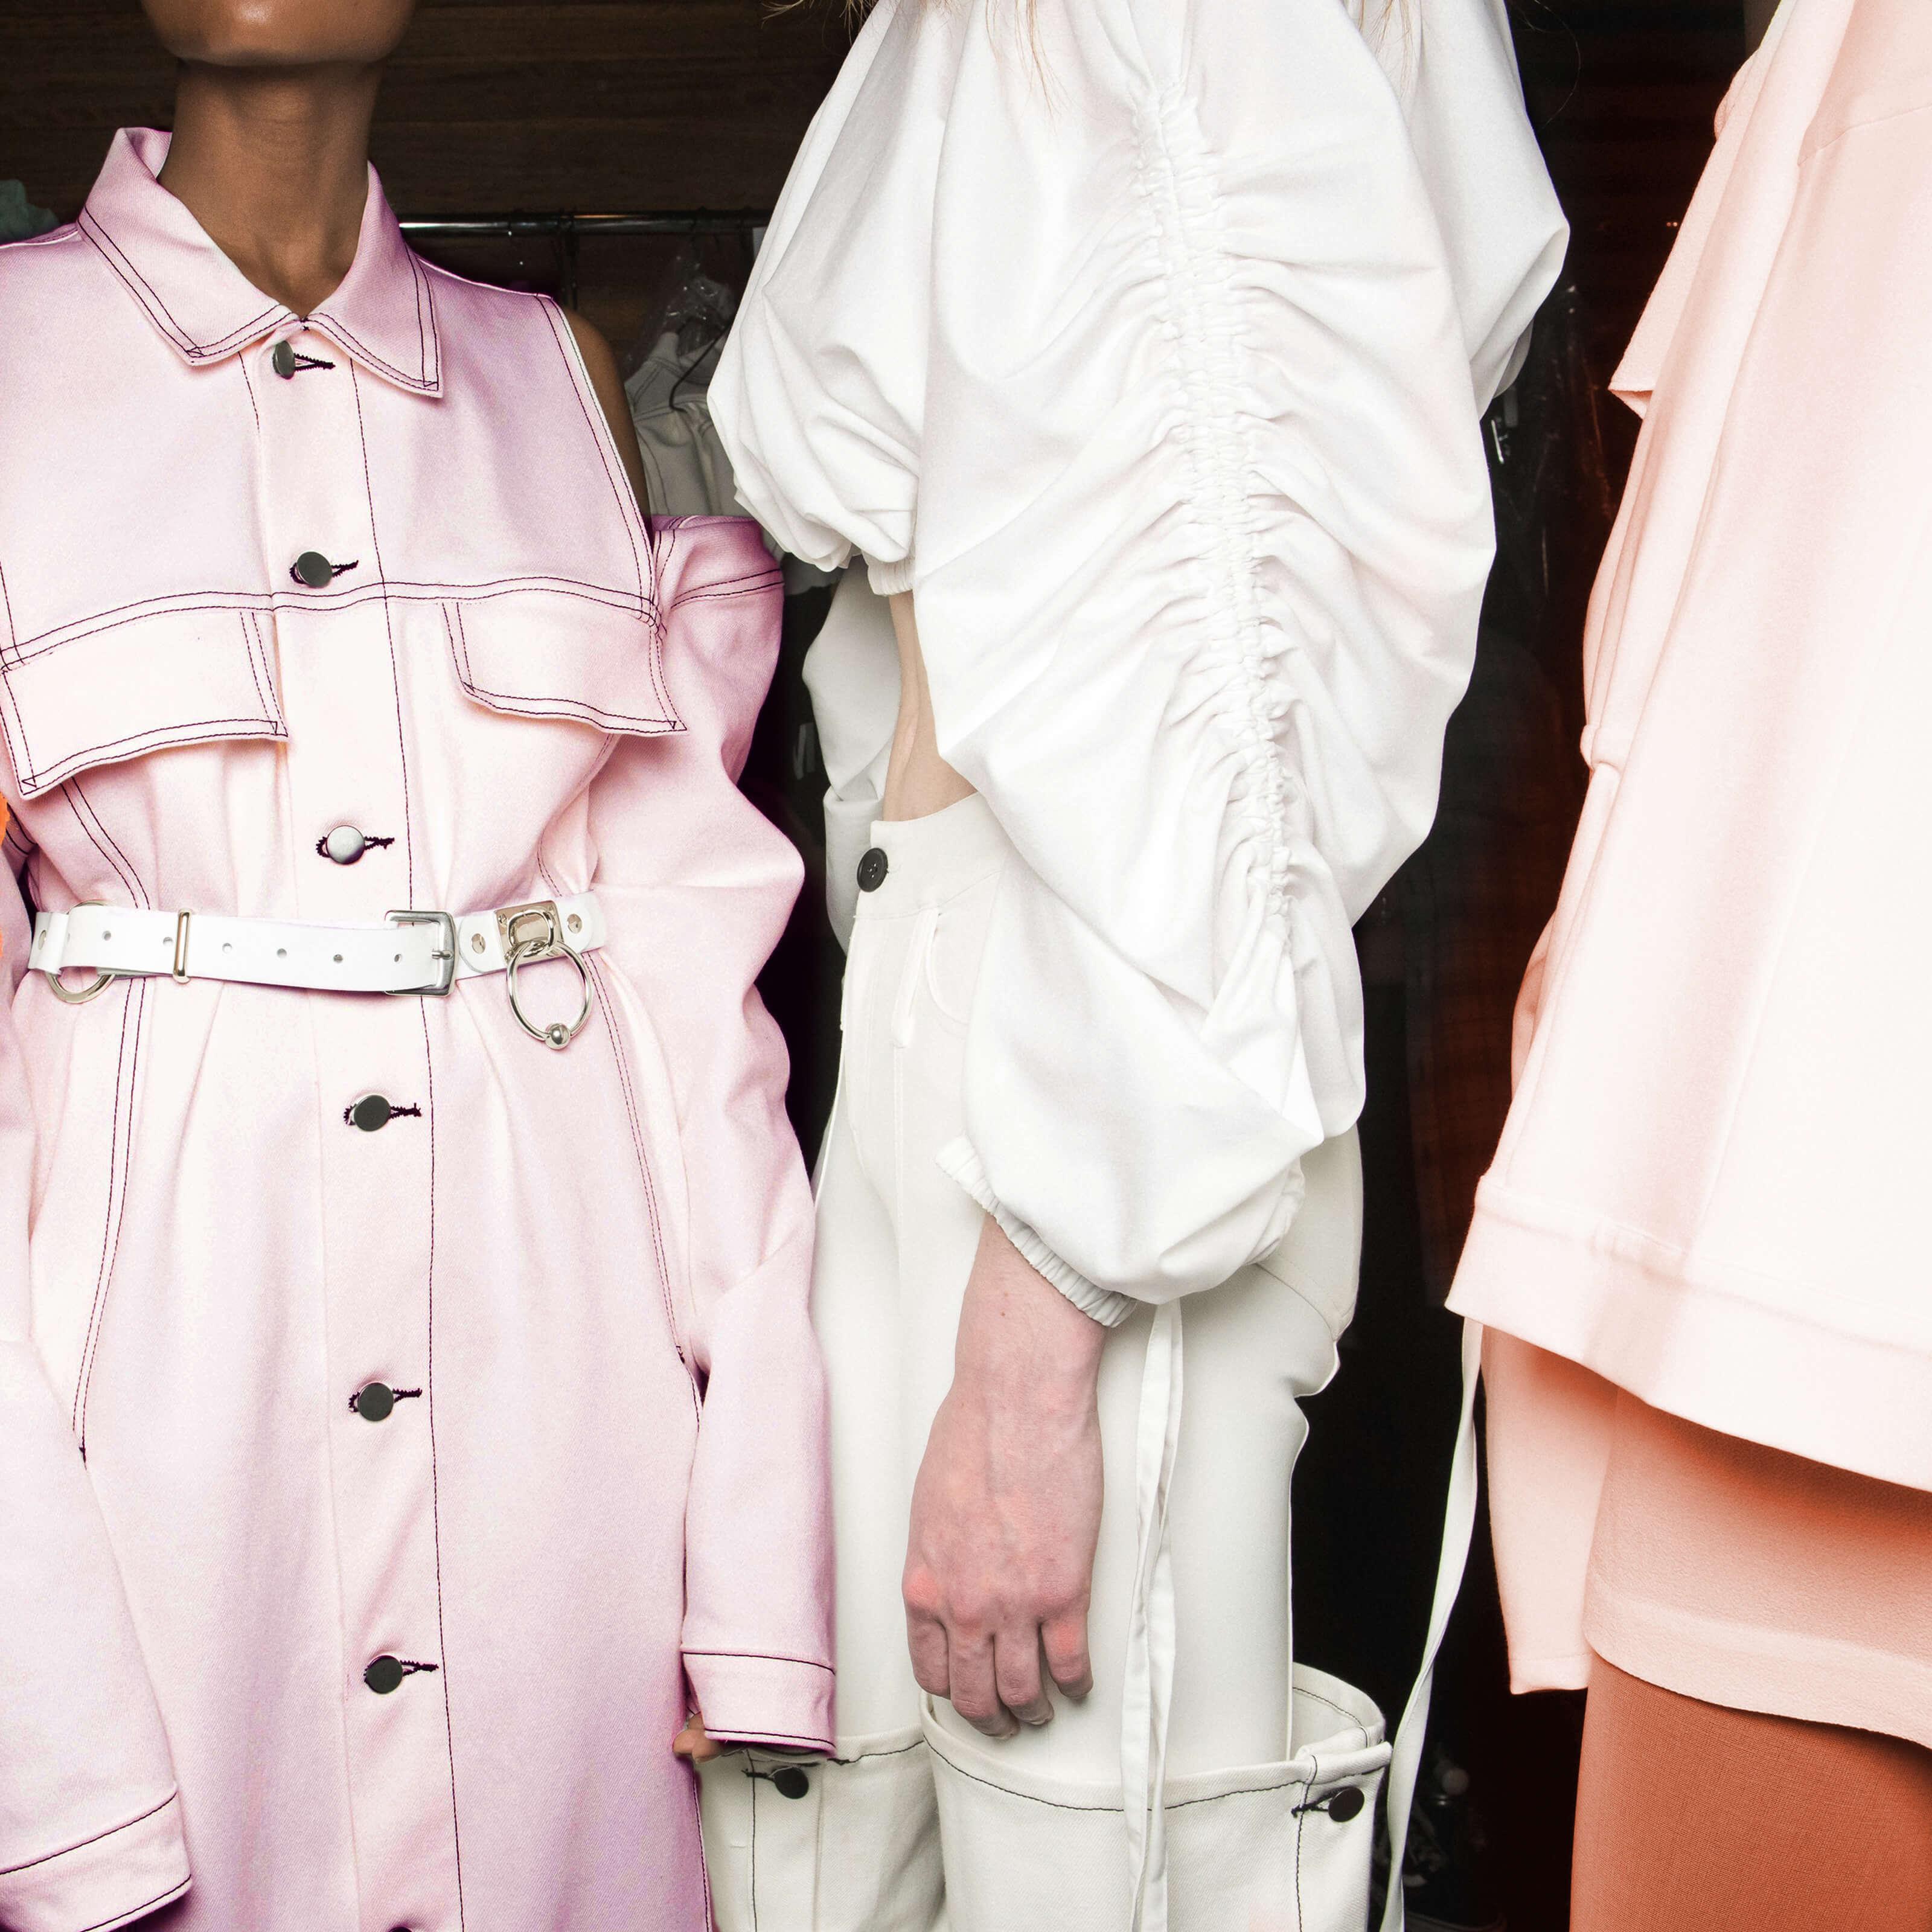 Why I Didn't Go to New York Fashion Week